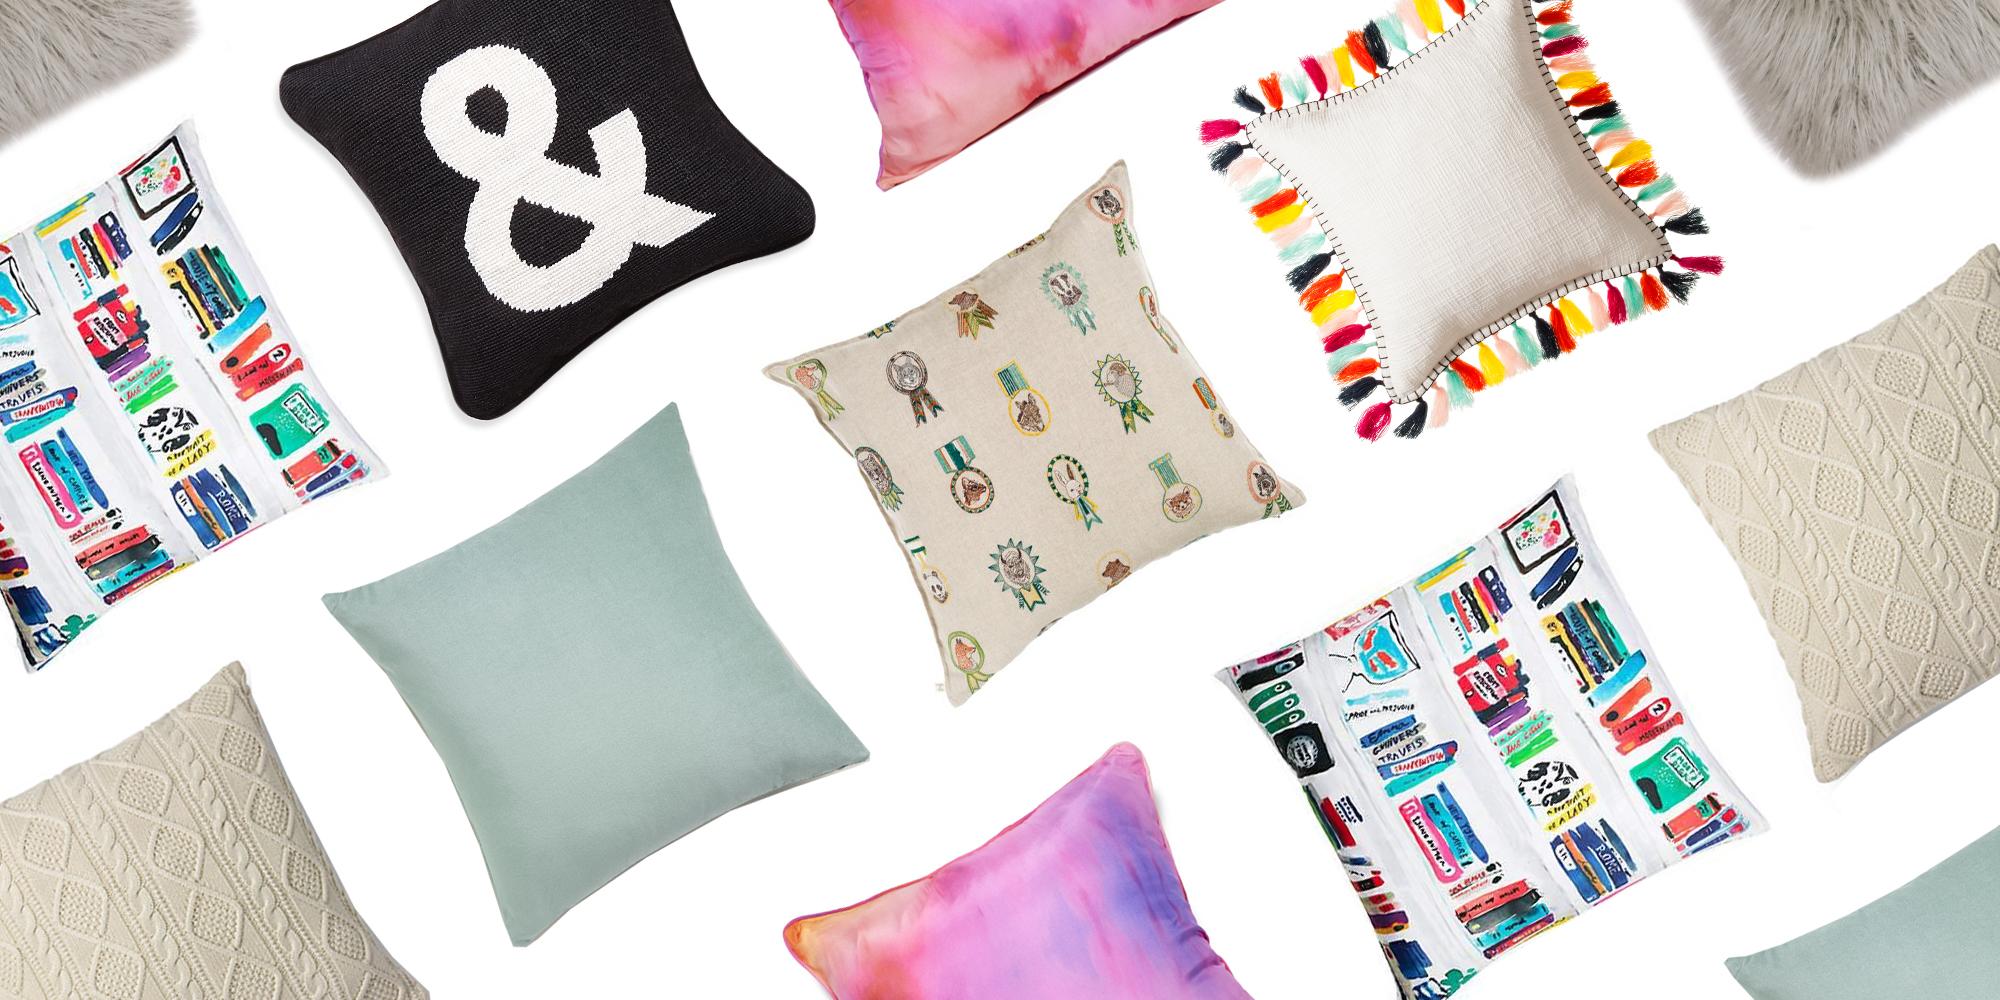 Big Comfy Throw Pillows : 14 Best Decorative Throw Pillows in 2017 - Comfy Couch Throw Pillows